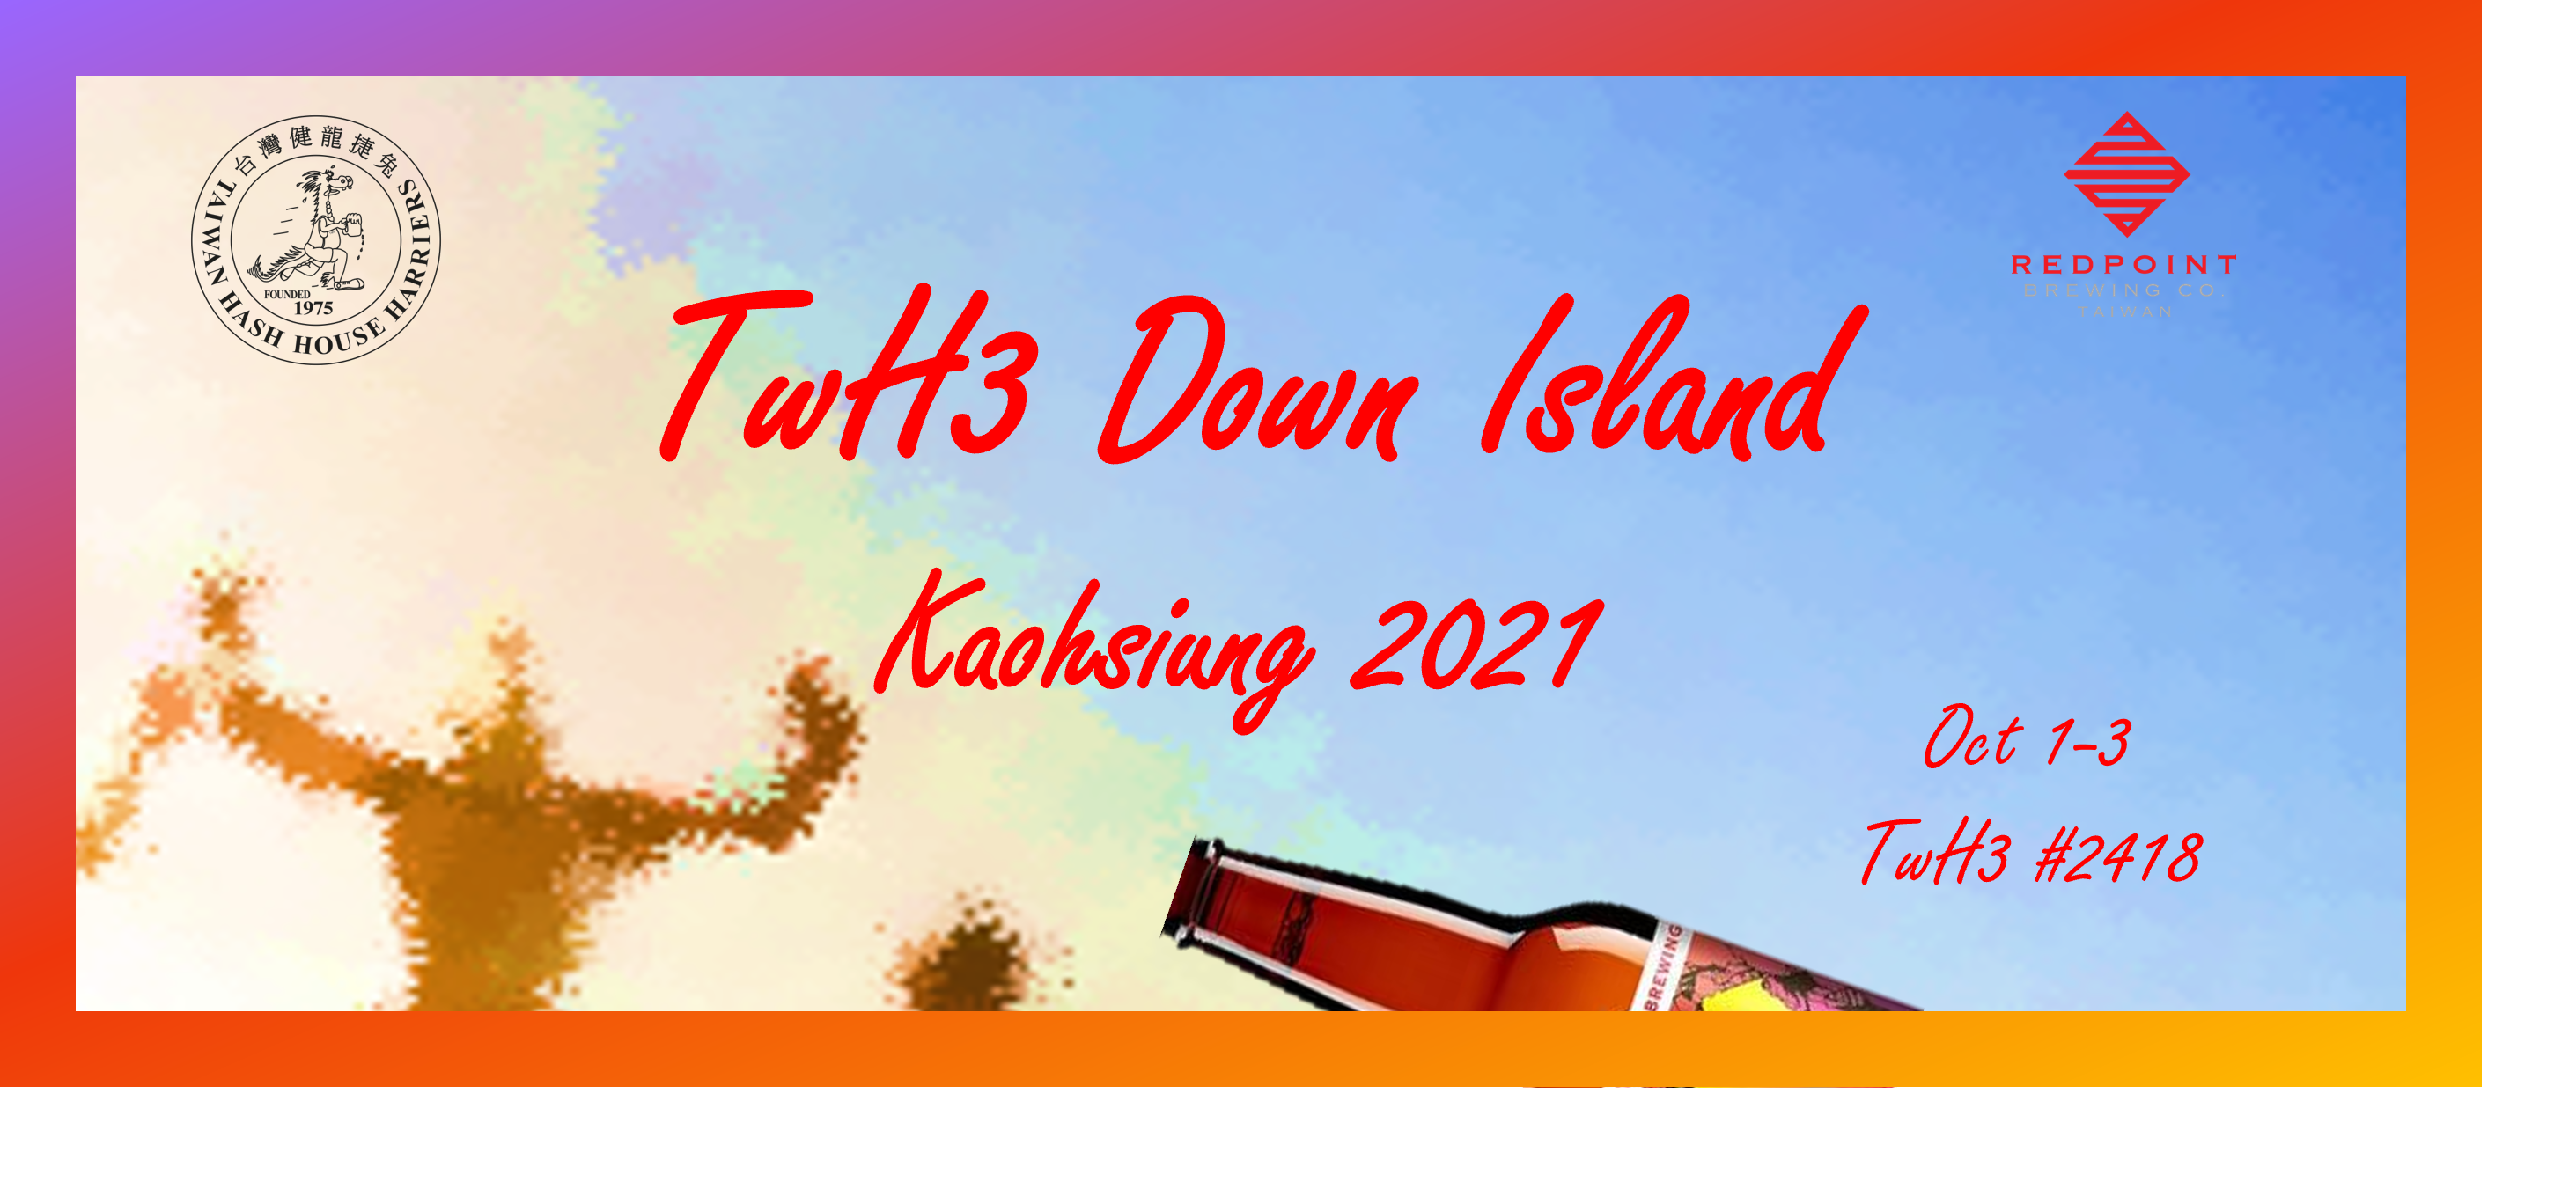 The Big Fat Beach Down Island Weekend 2021